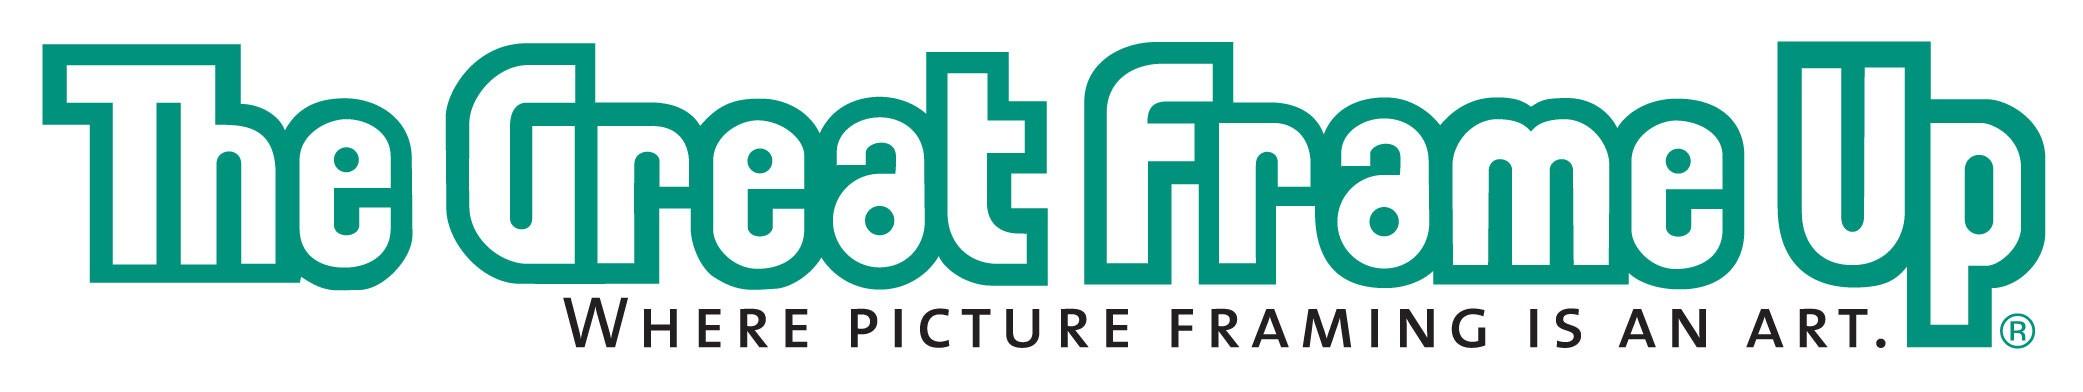 the-great-frame-up-sponsor-logo-impact-iowa